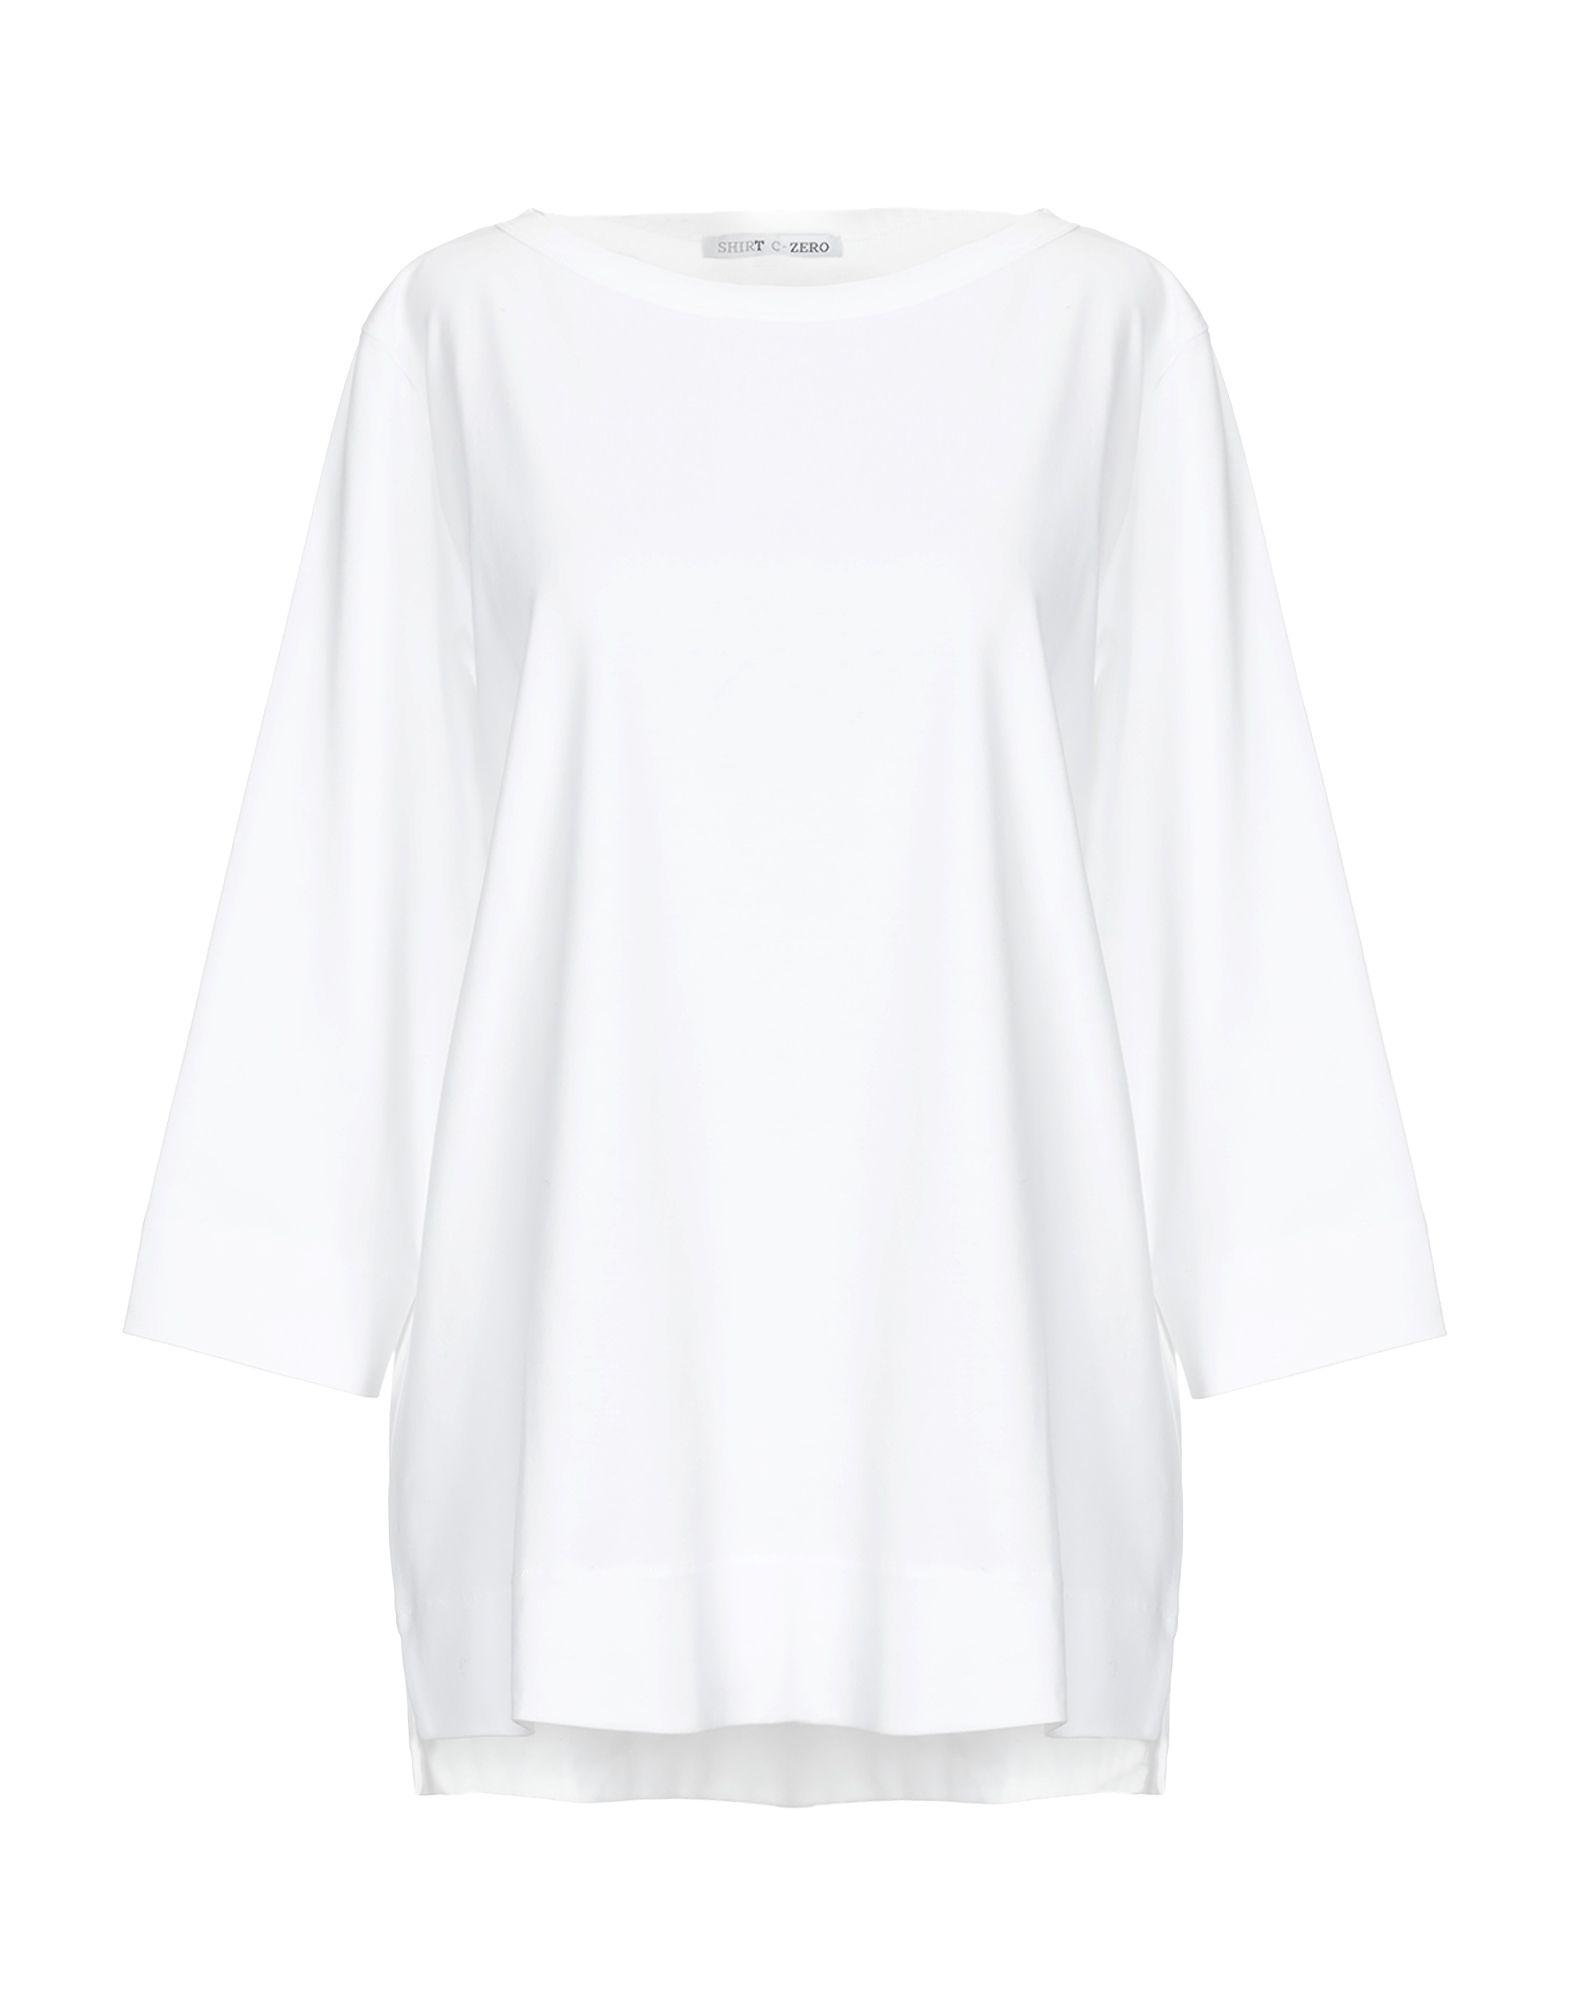 SHIRT C-ZERO Футболка shirt c zero топ без рукавов